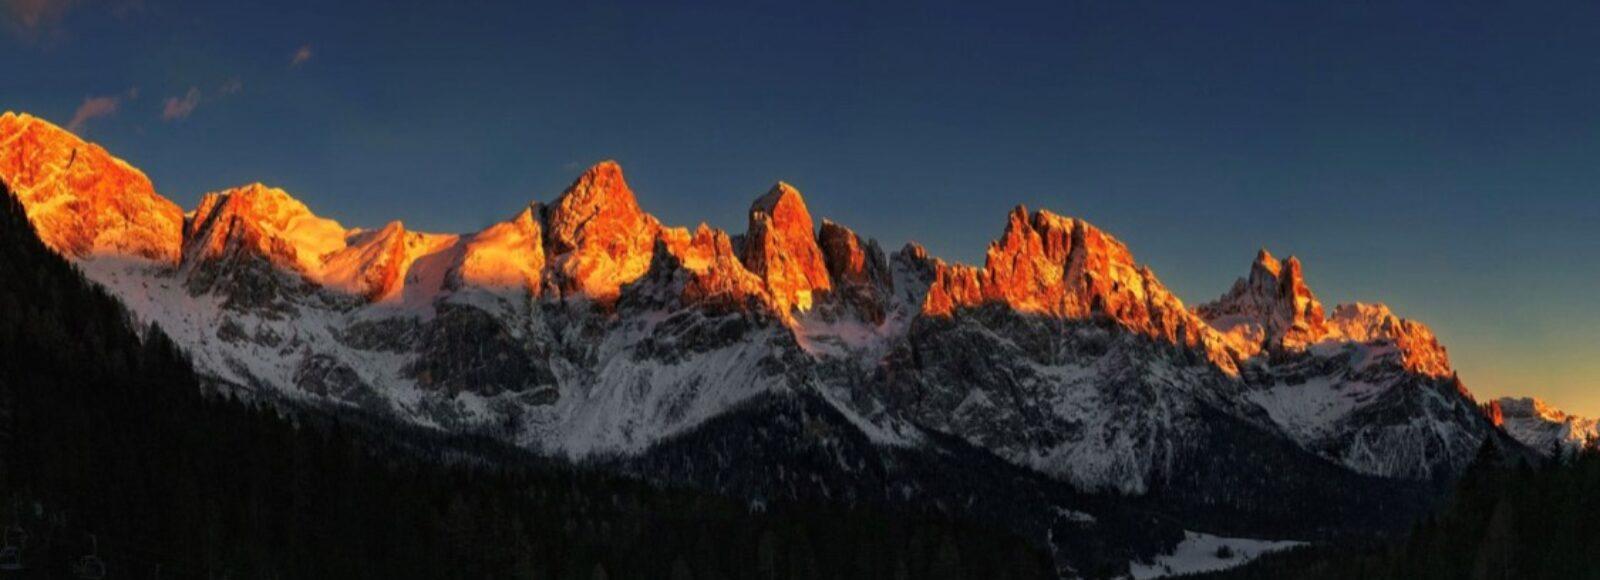 Dolomiti - Enrosadira